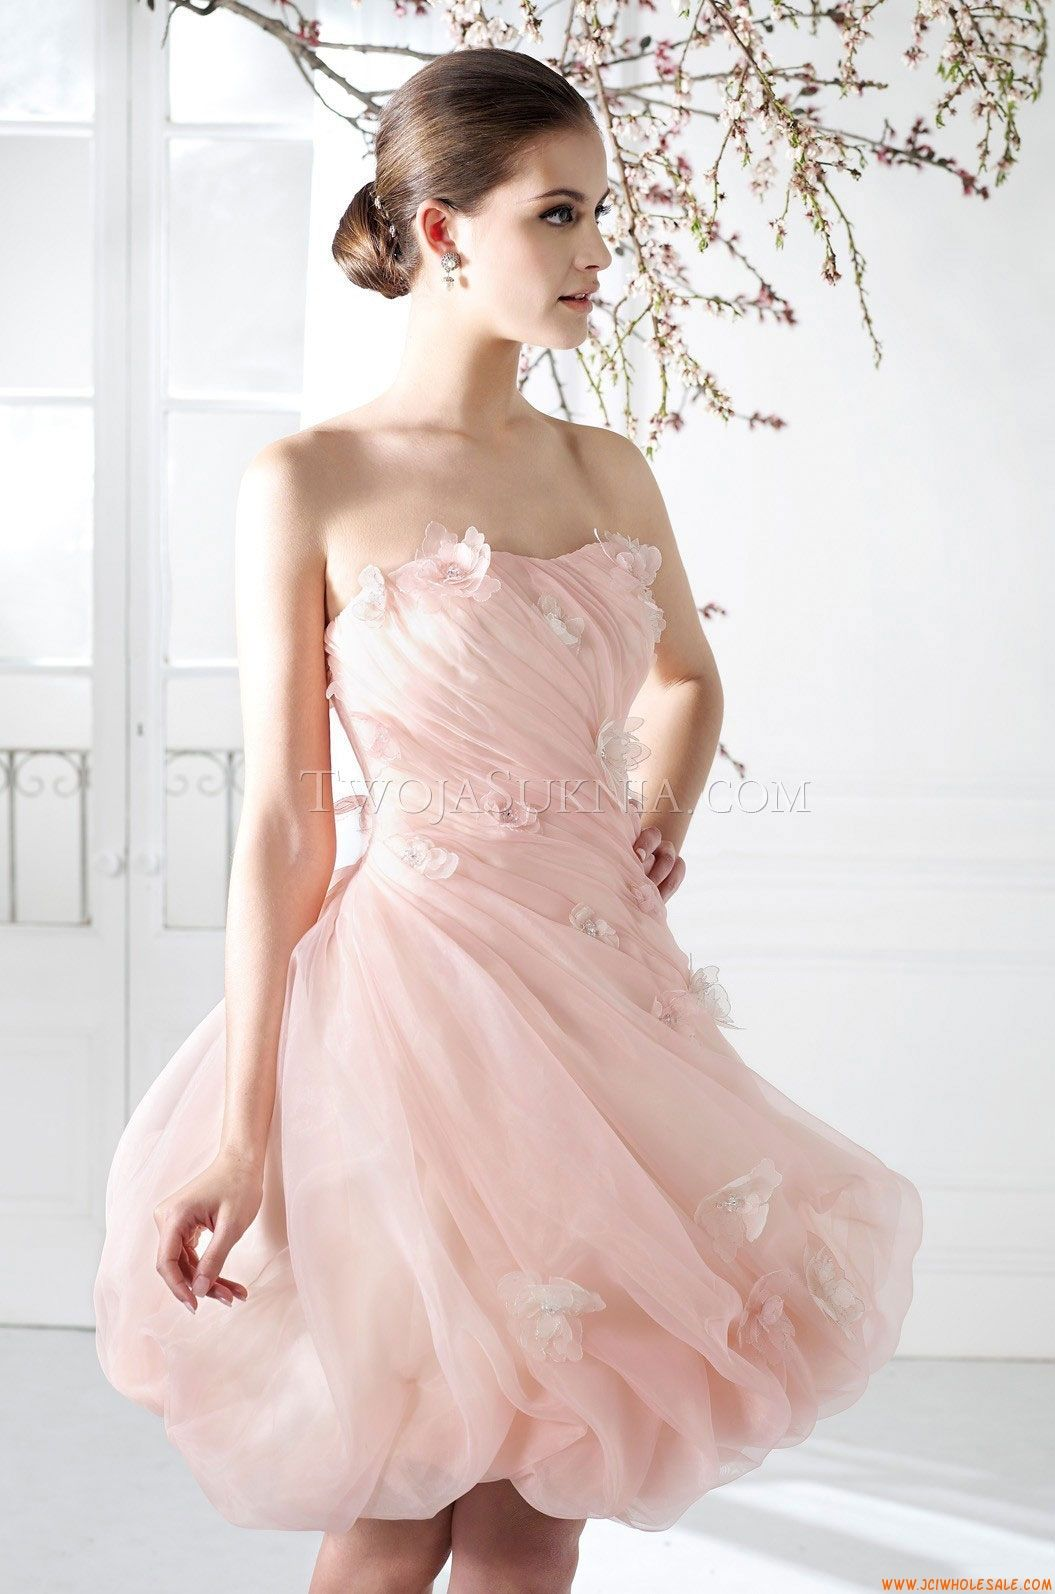 Robe de mariée Fara Sposa 5289 2013 | robe de mariée sur mesure ...